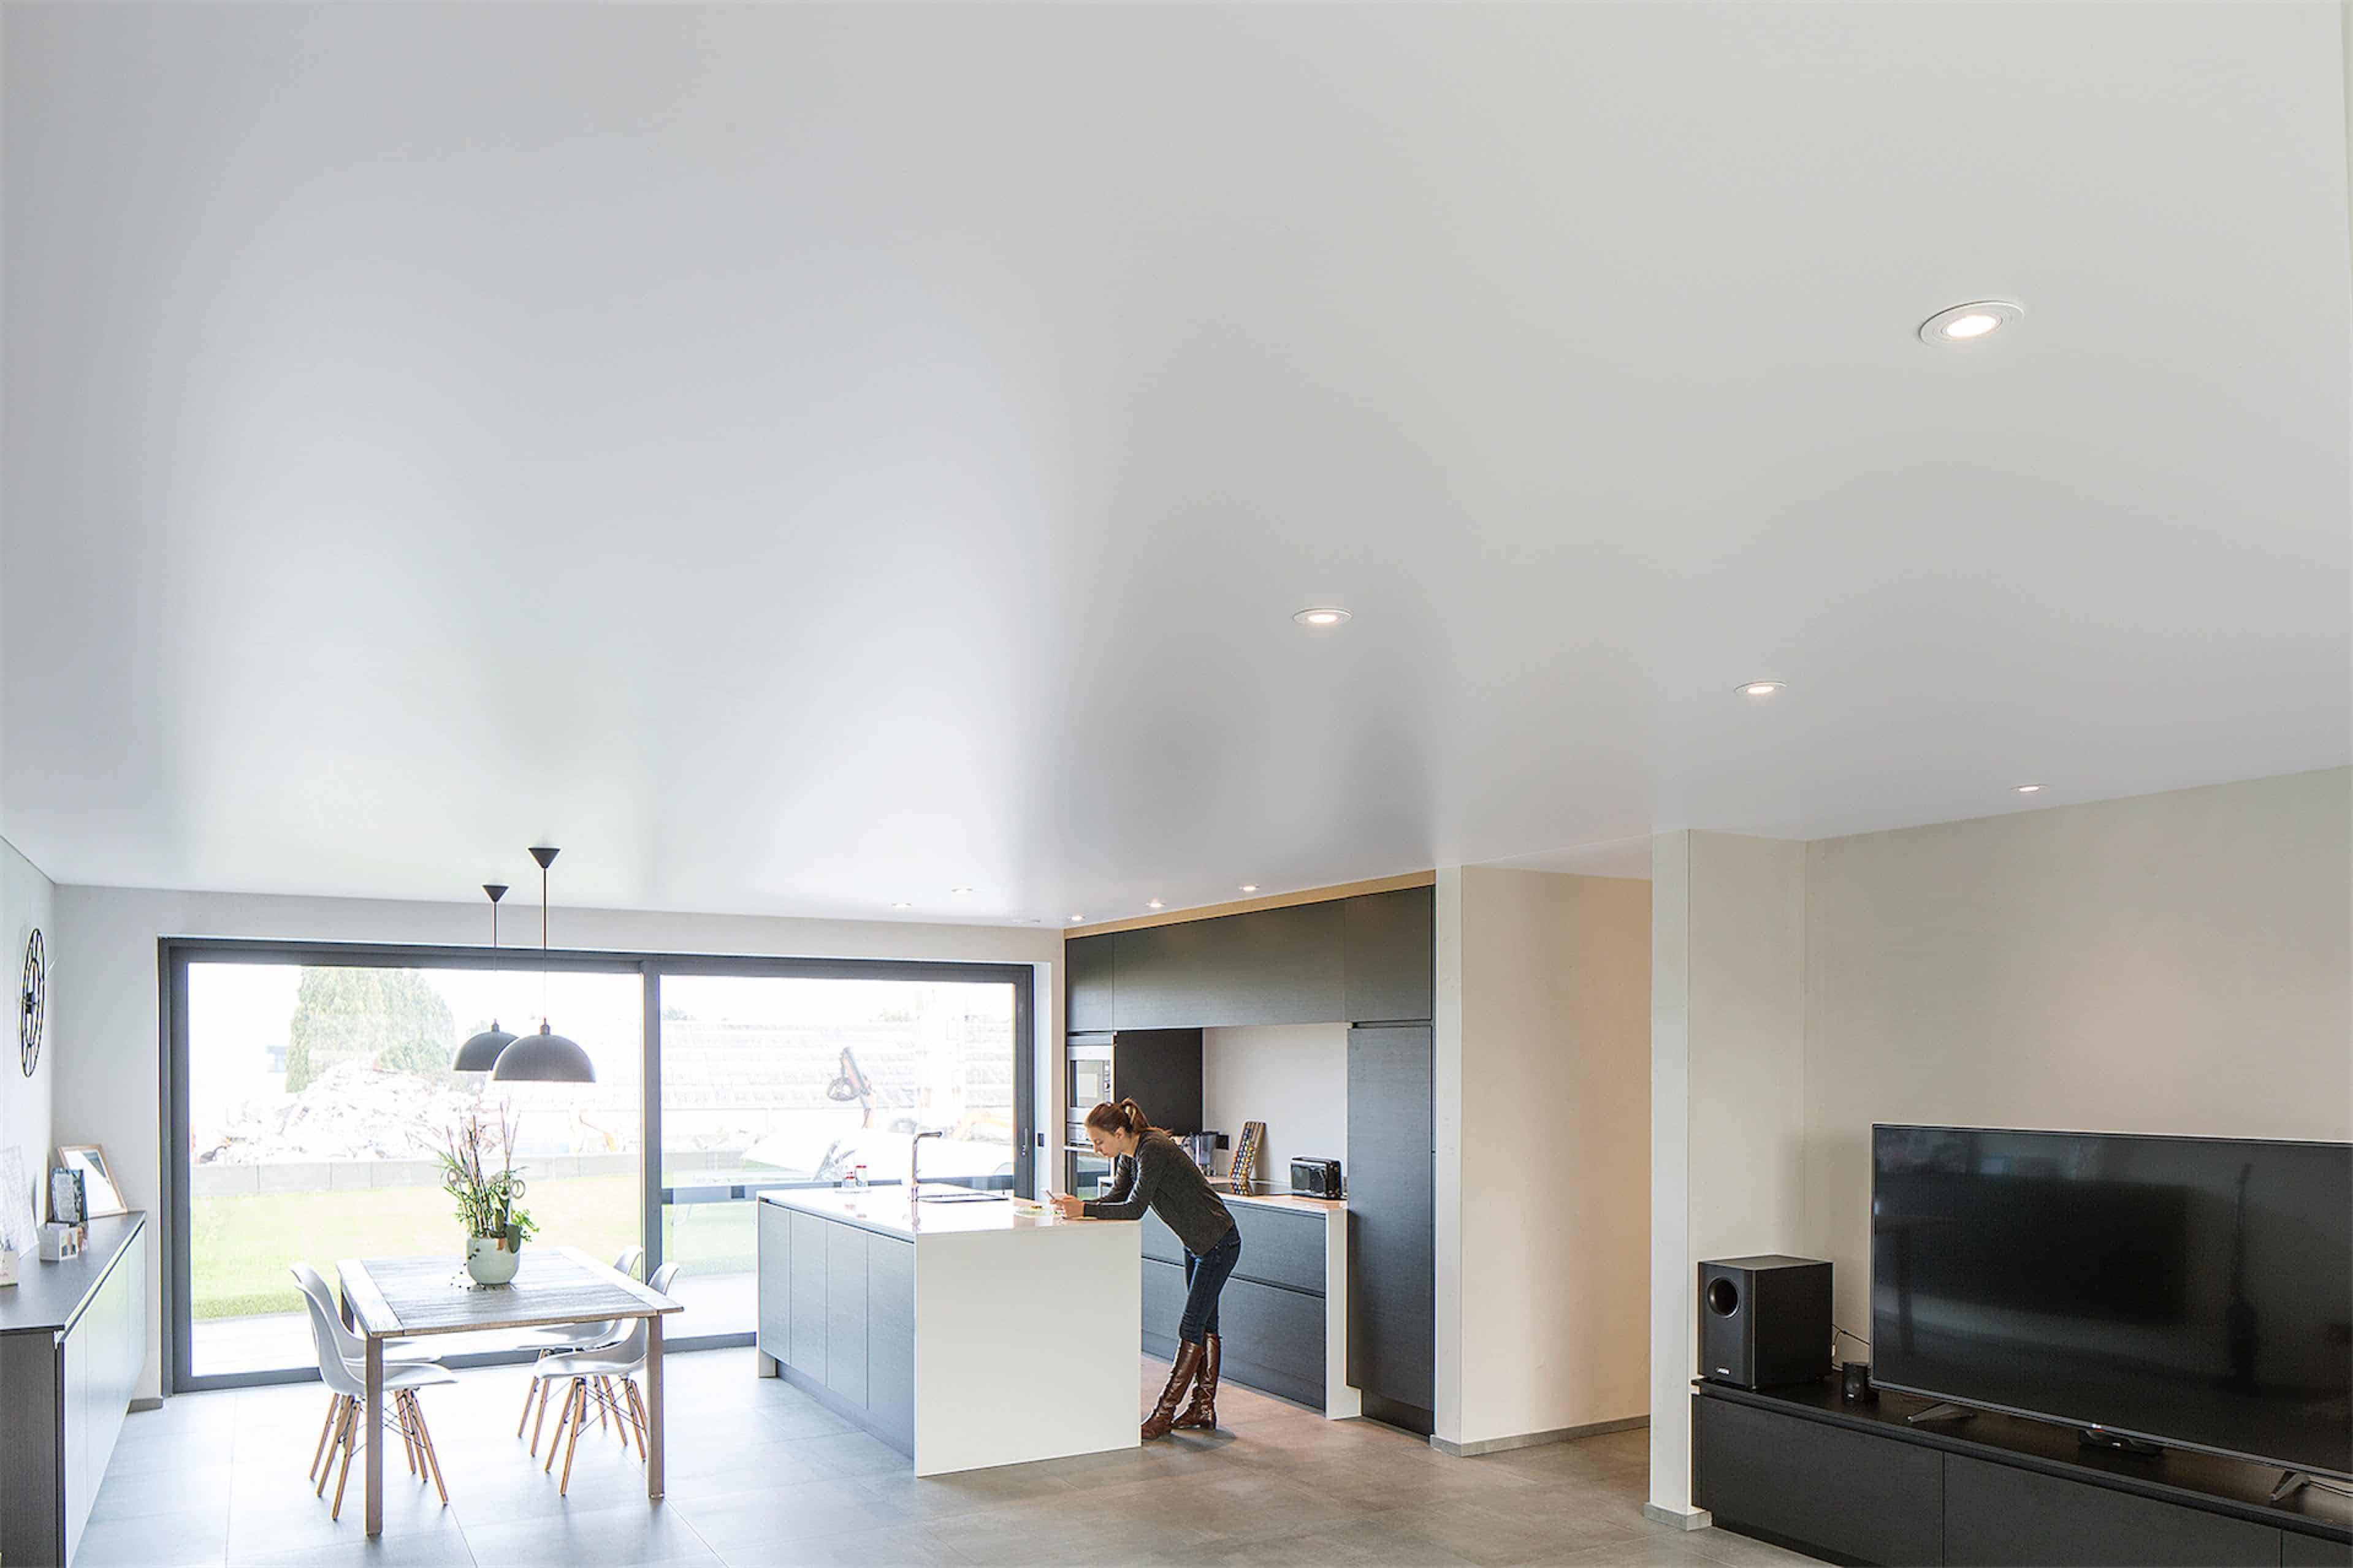 Plafond Badkamer: 5 Soorten Plafondbekleding - Voordelen, Advies ...